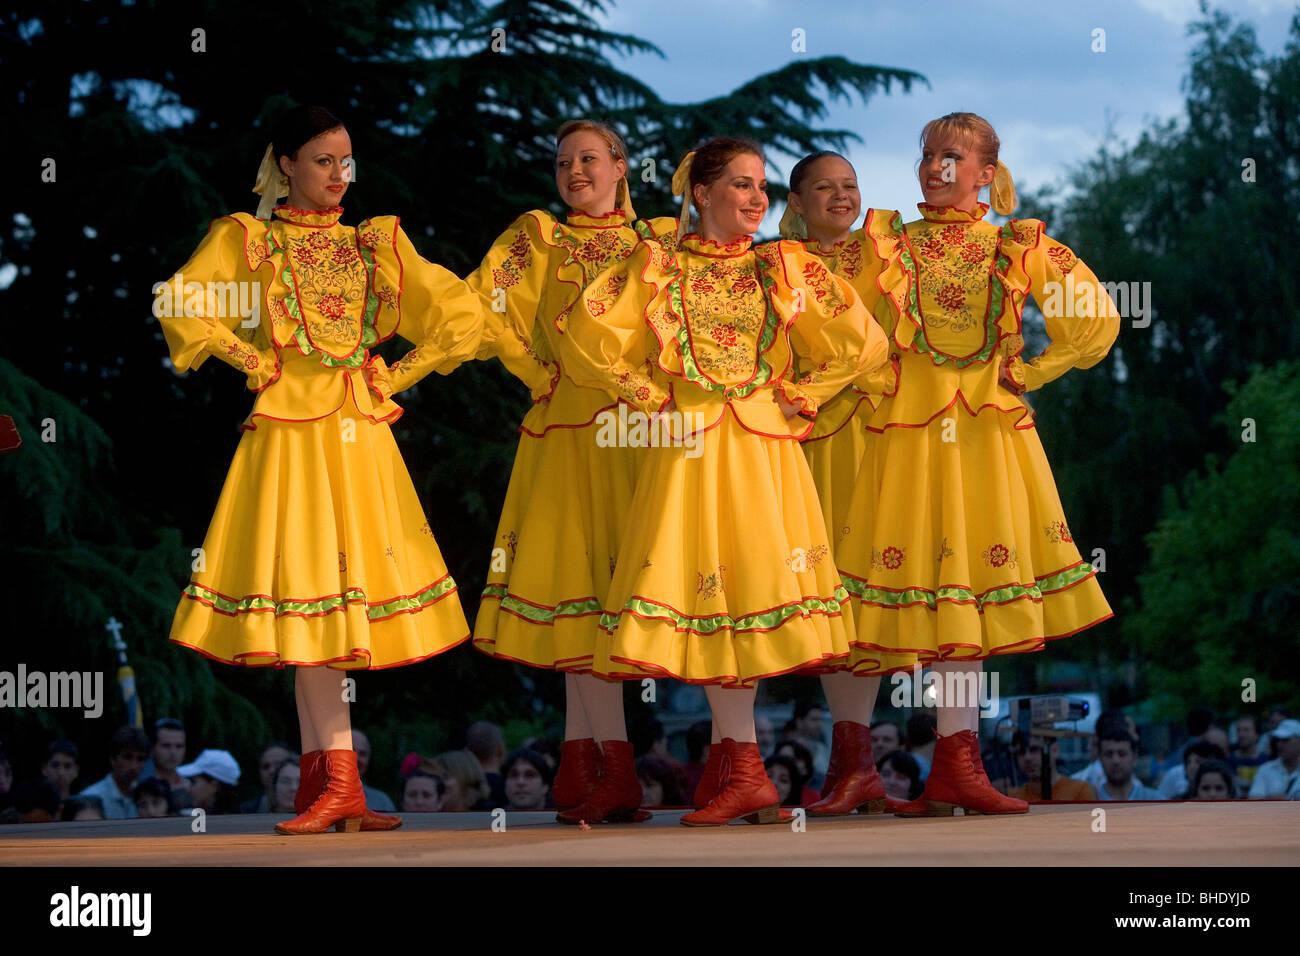 Russland Folklore Kostume Traditionelle Kleidung Internationales